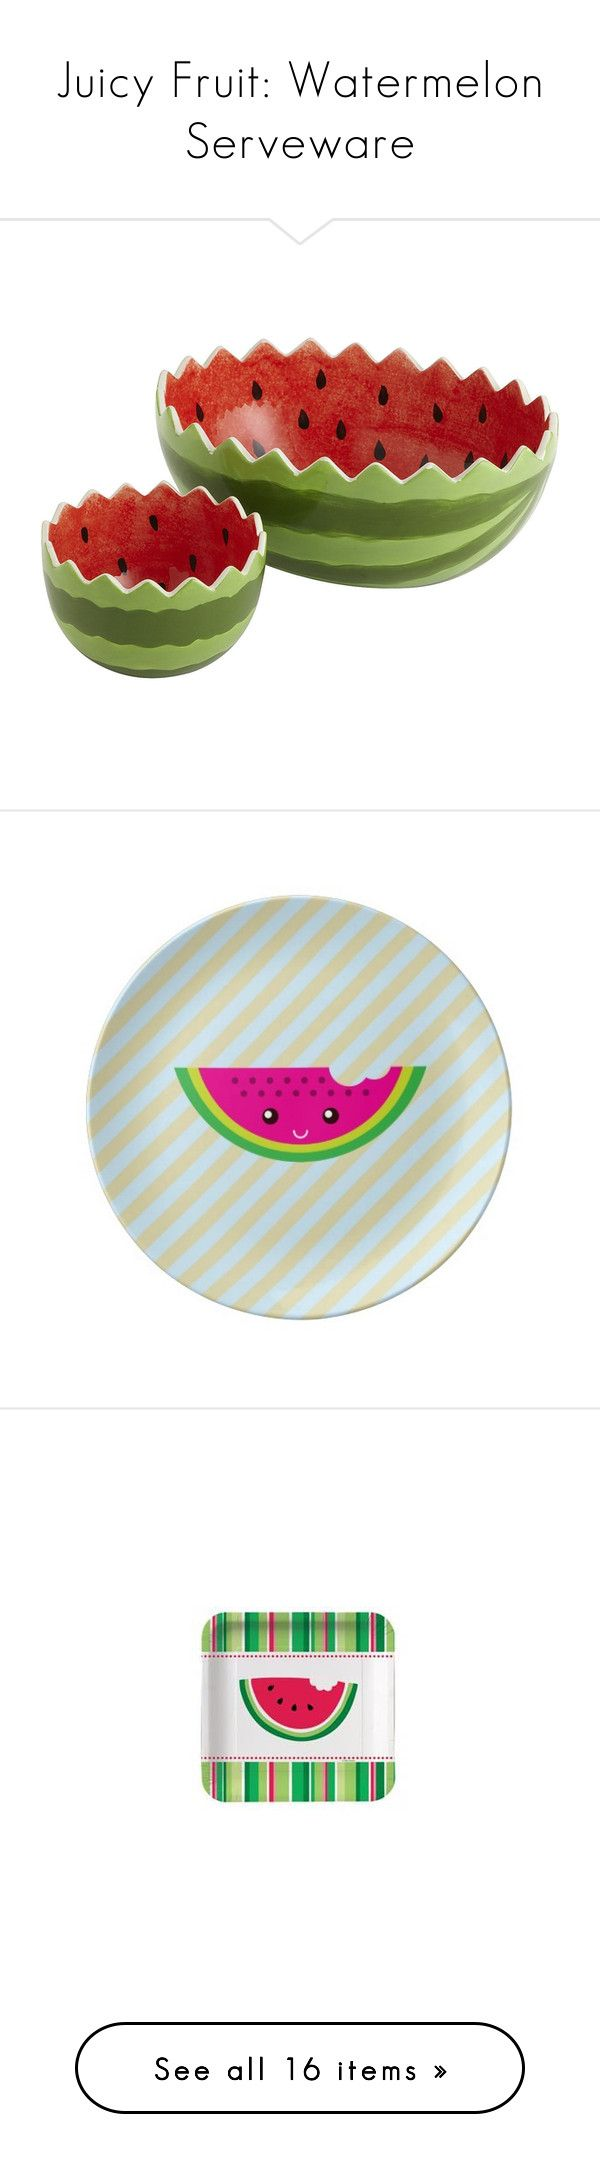 Home interior fruit plates juicy fruit watermelon serveware